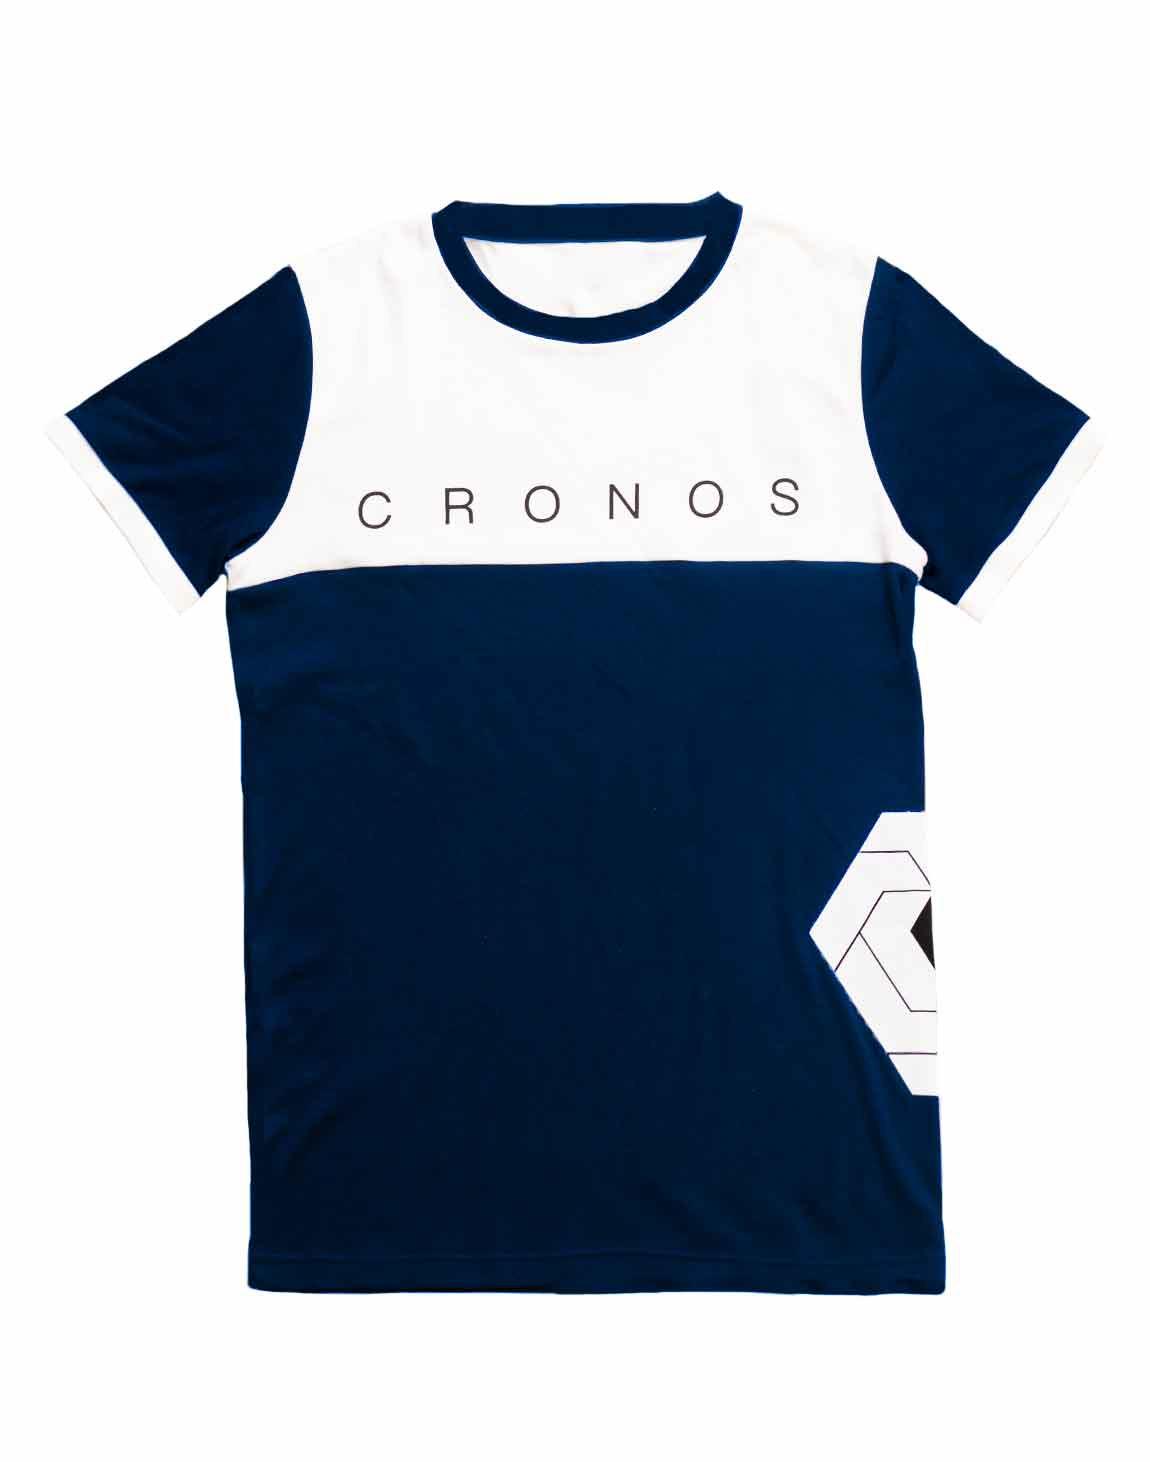 CRONOS Bi-COLOR SIDE LOGO T-SHIRTS【NAVY×WHITE】